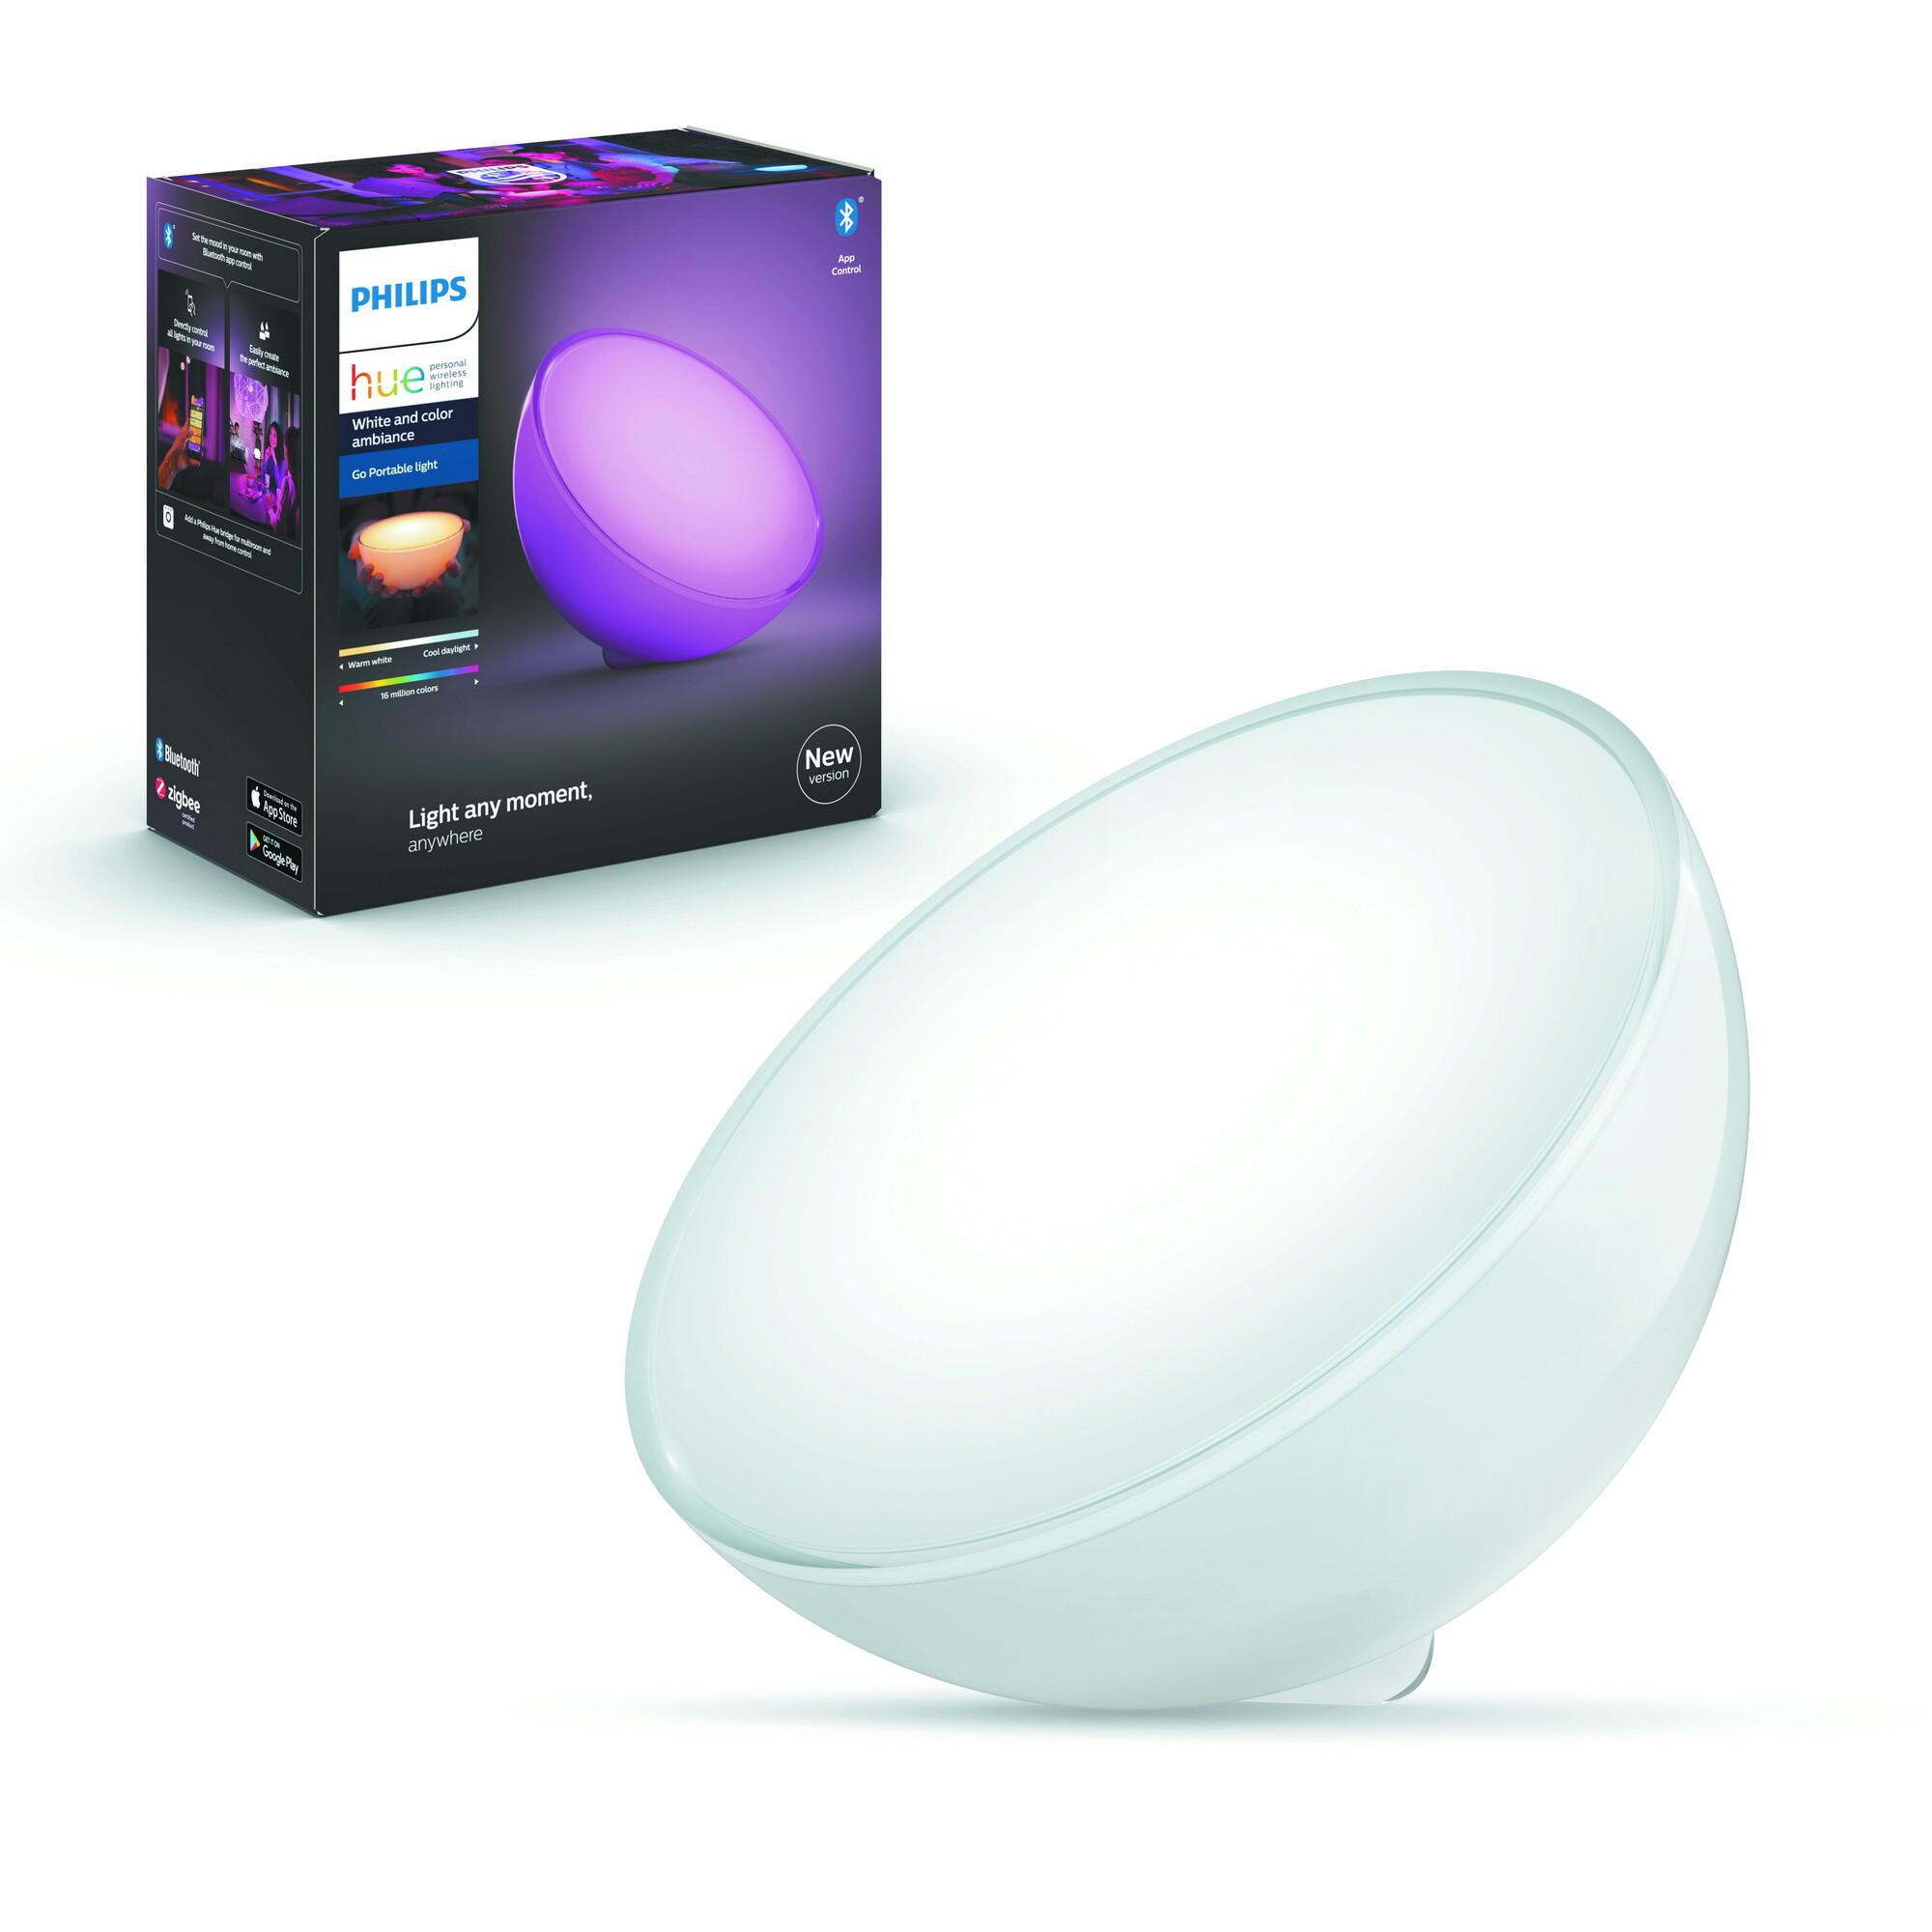 Philips HUE GO Tafellamp LED 1x6W/520lm Wit